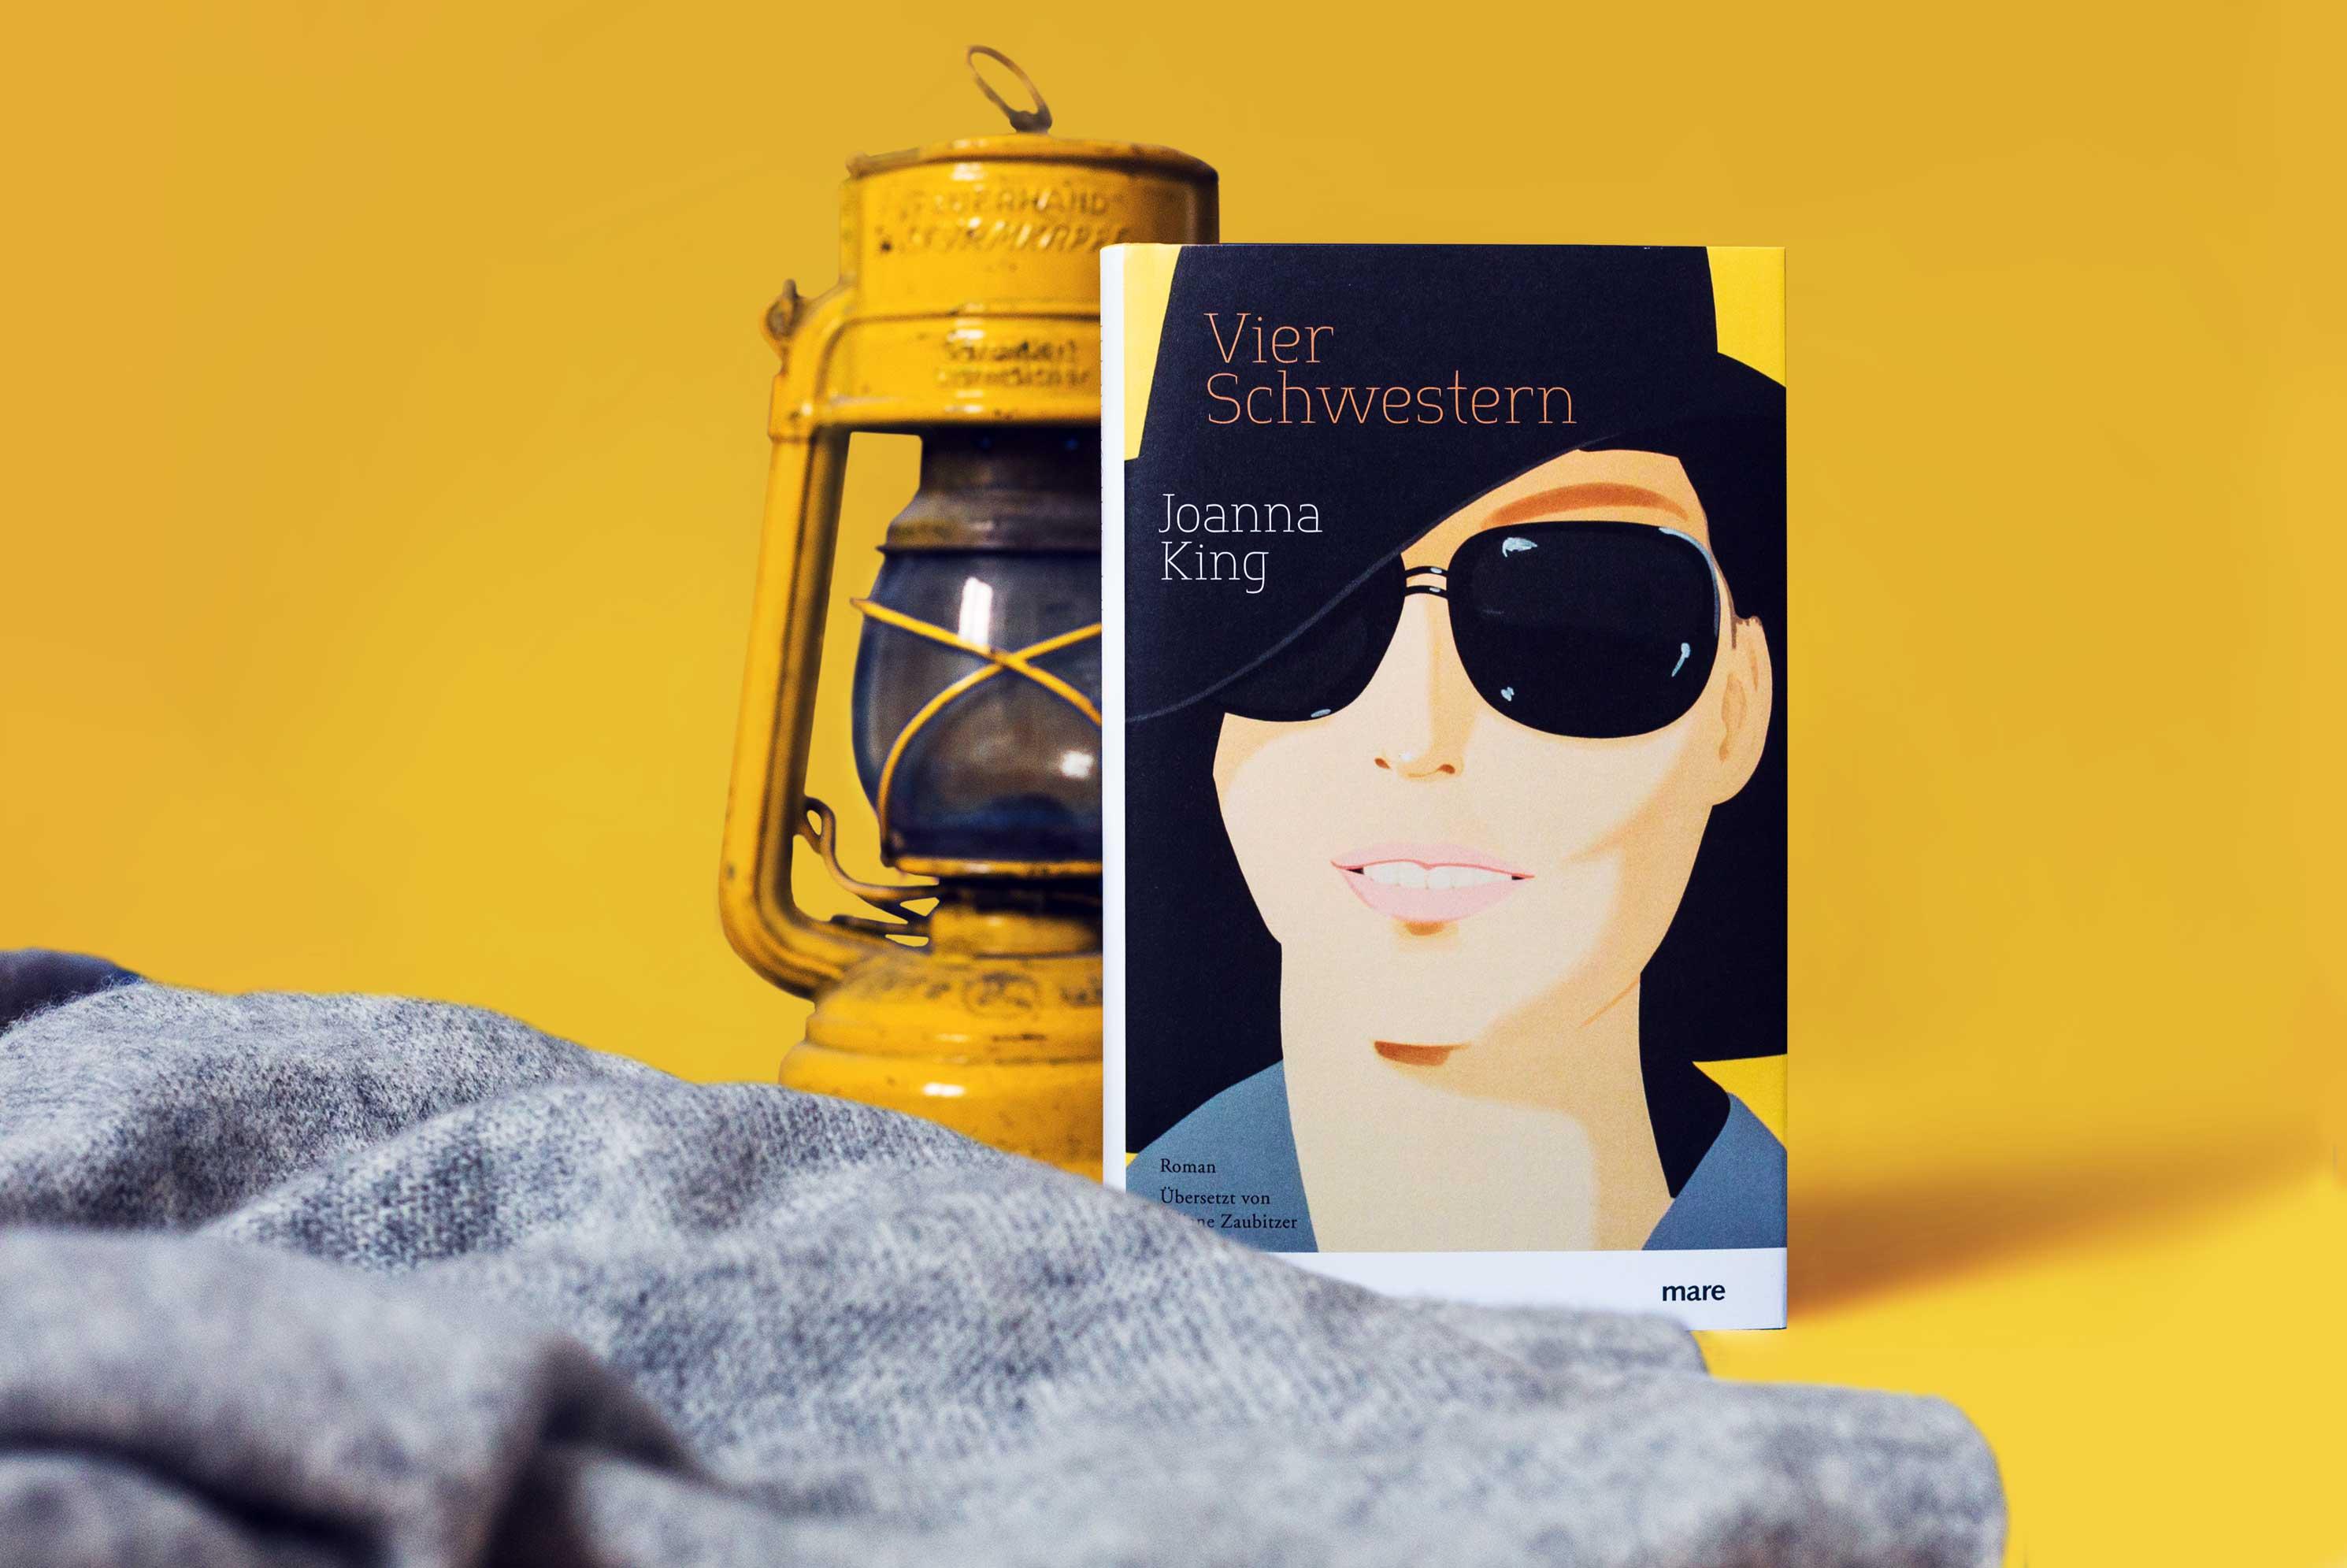 joanna-king-vier-schwestern-schonhalbelf-buchblog-roman-kritik-tipp-rezension-lifestyle-neuerscheinung-februar